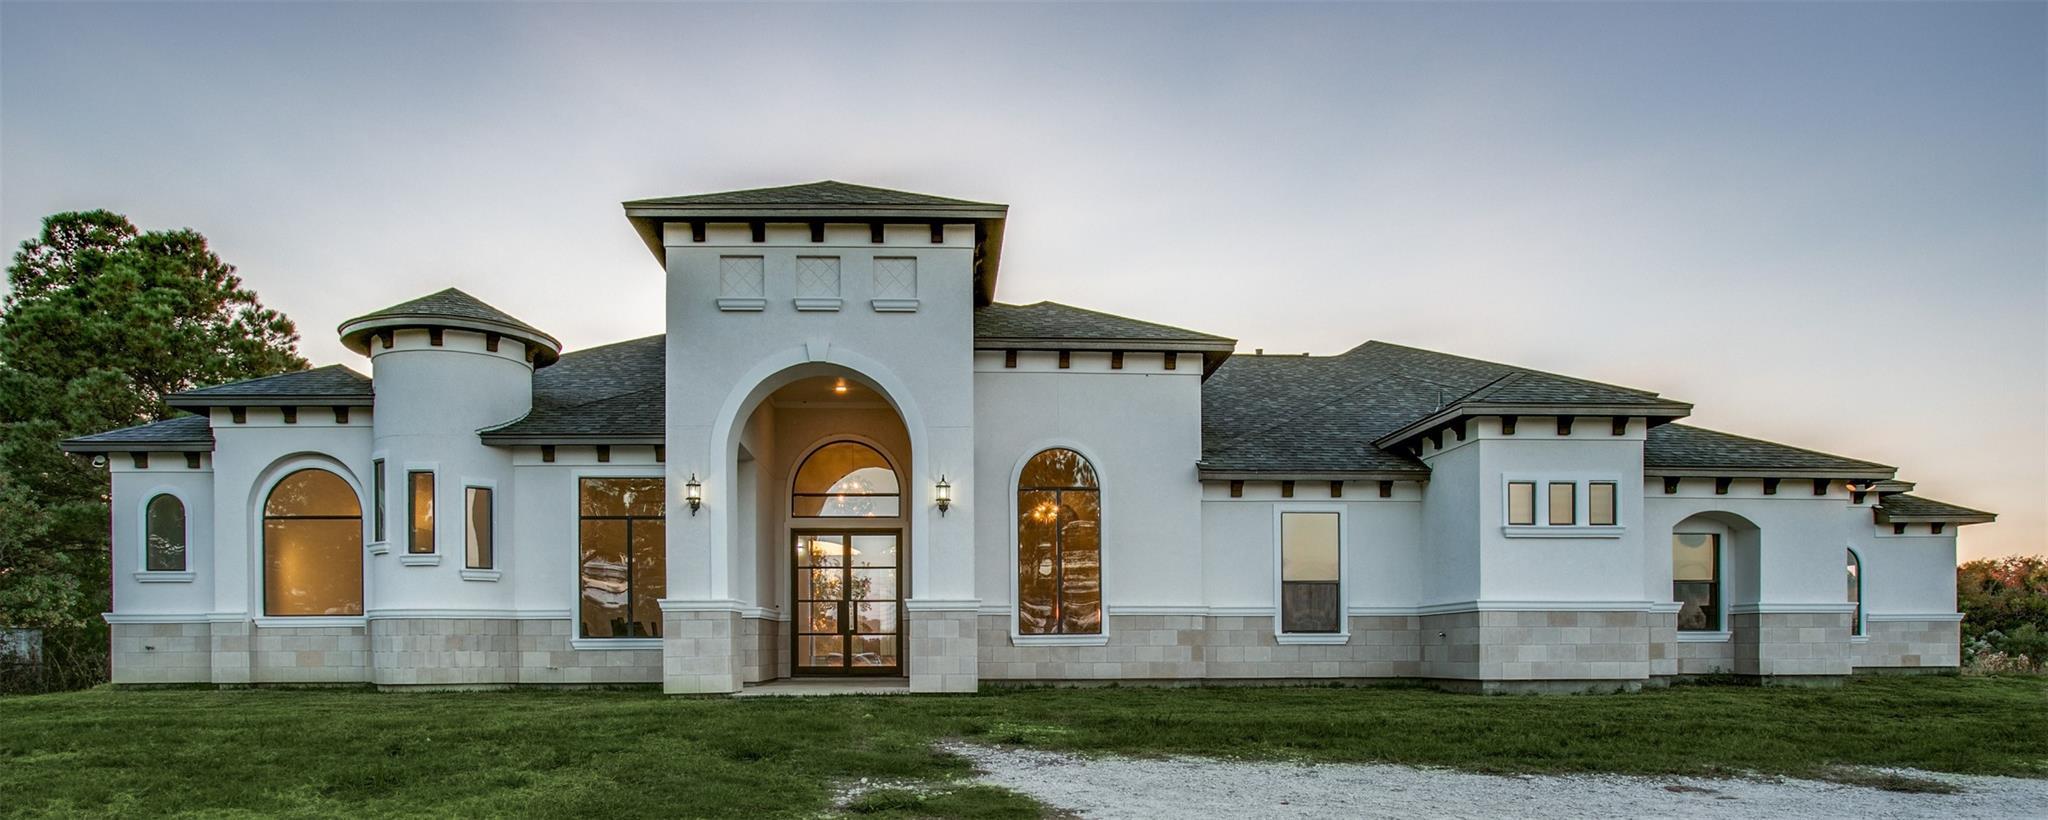 9827 N Main St Street Property Photo - Baytown, TX real estate listing